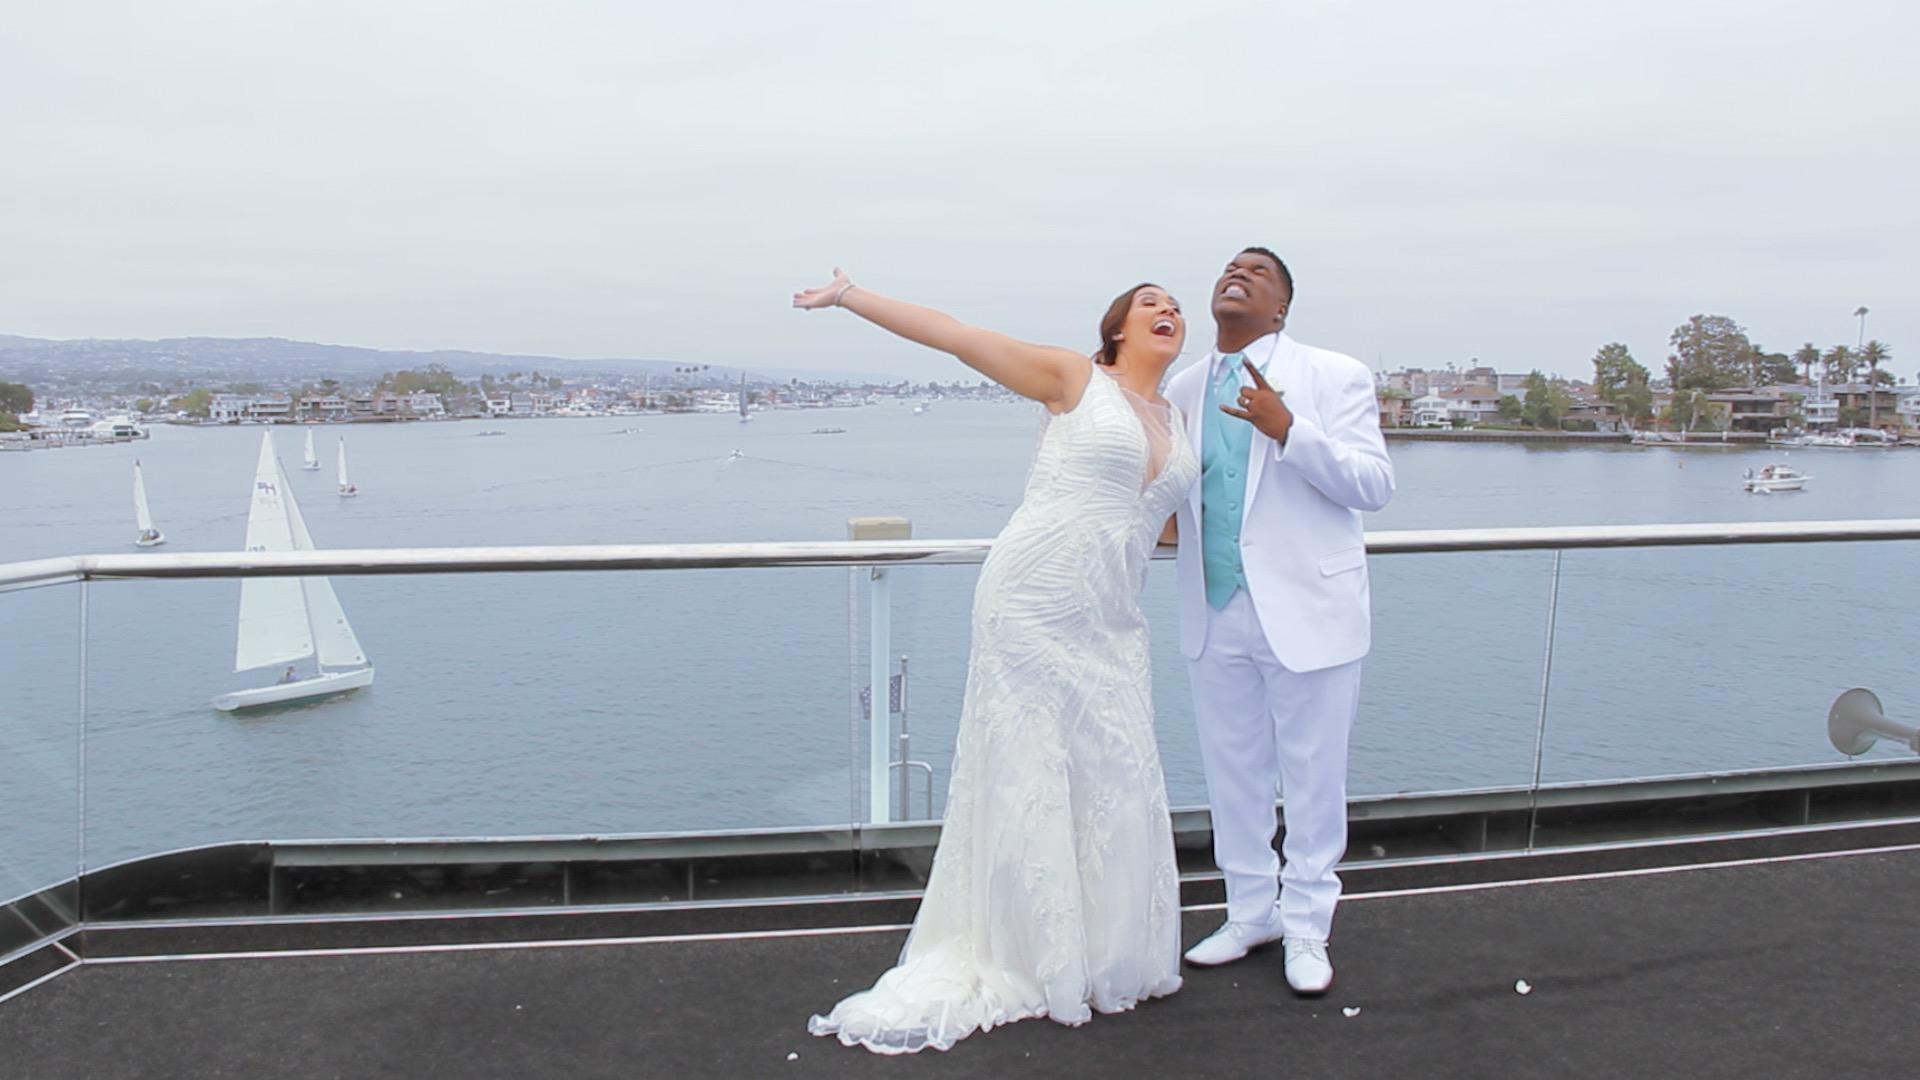 Shea + Patrick   Newport Beach, California   Electra Cruises